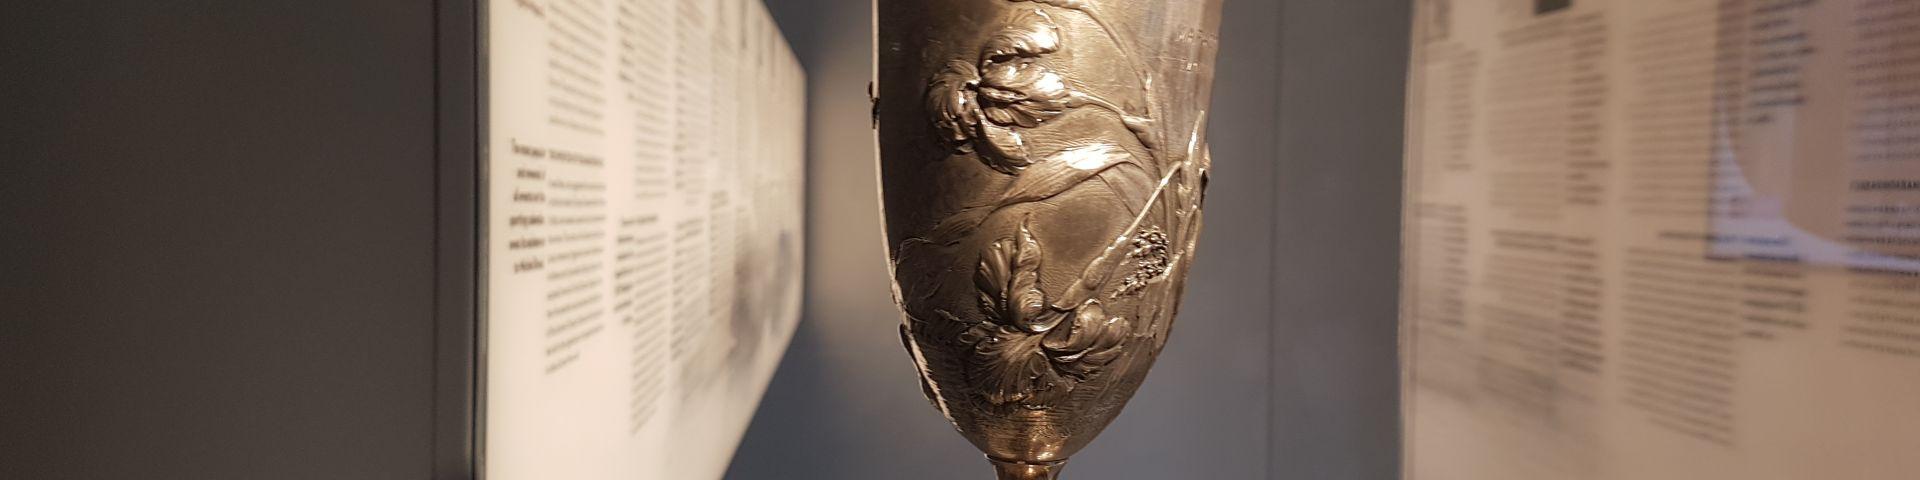 Spyros Louis Cup - Εικόνα